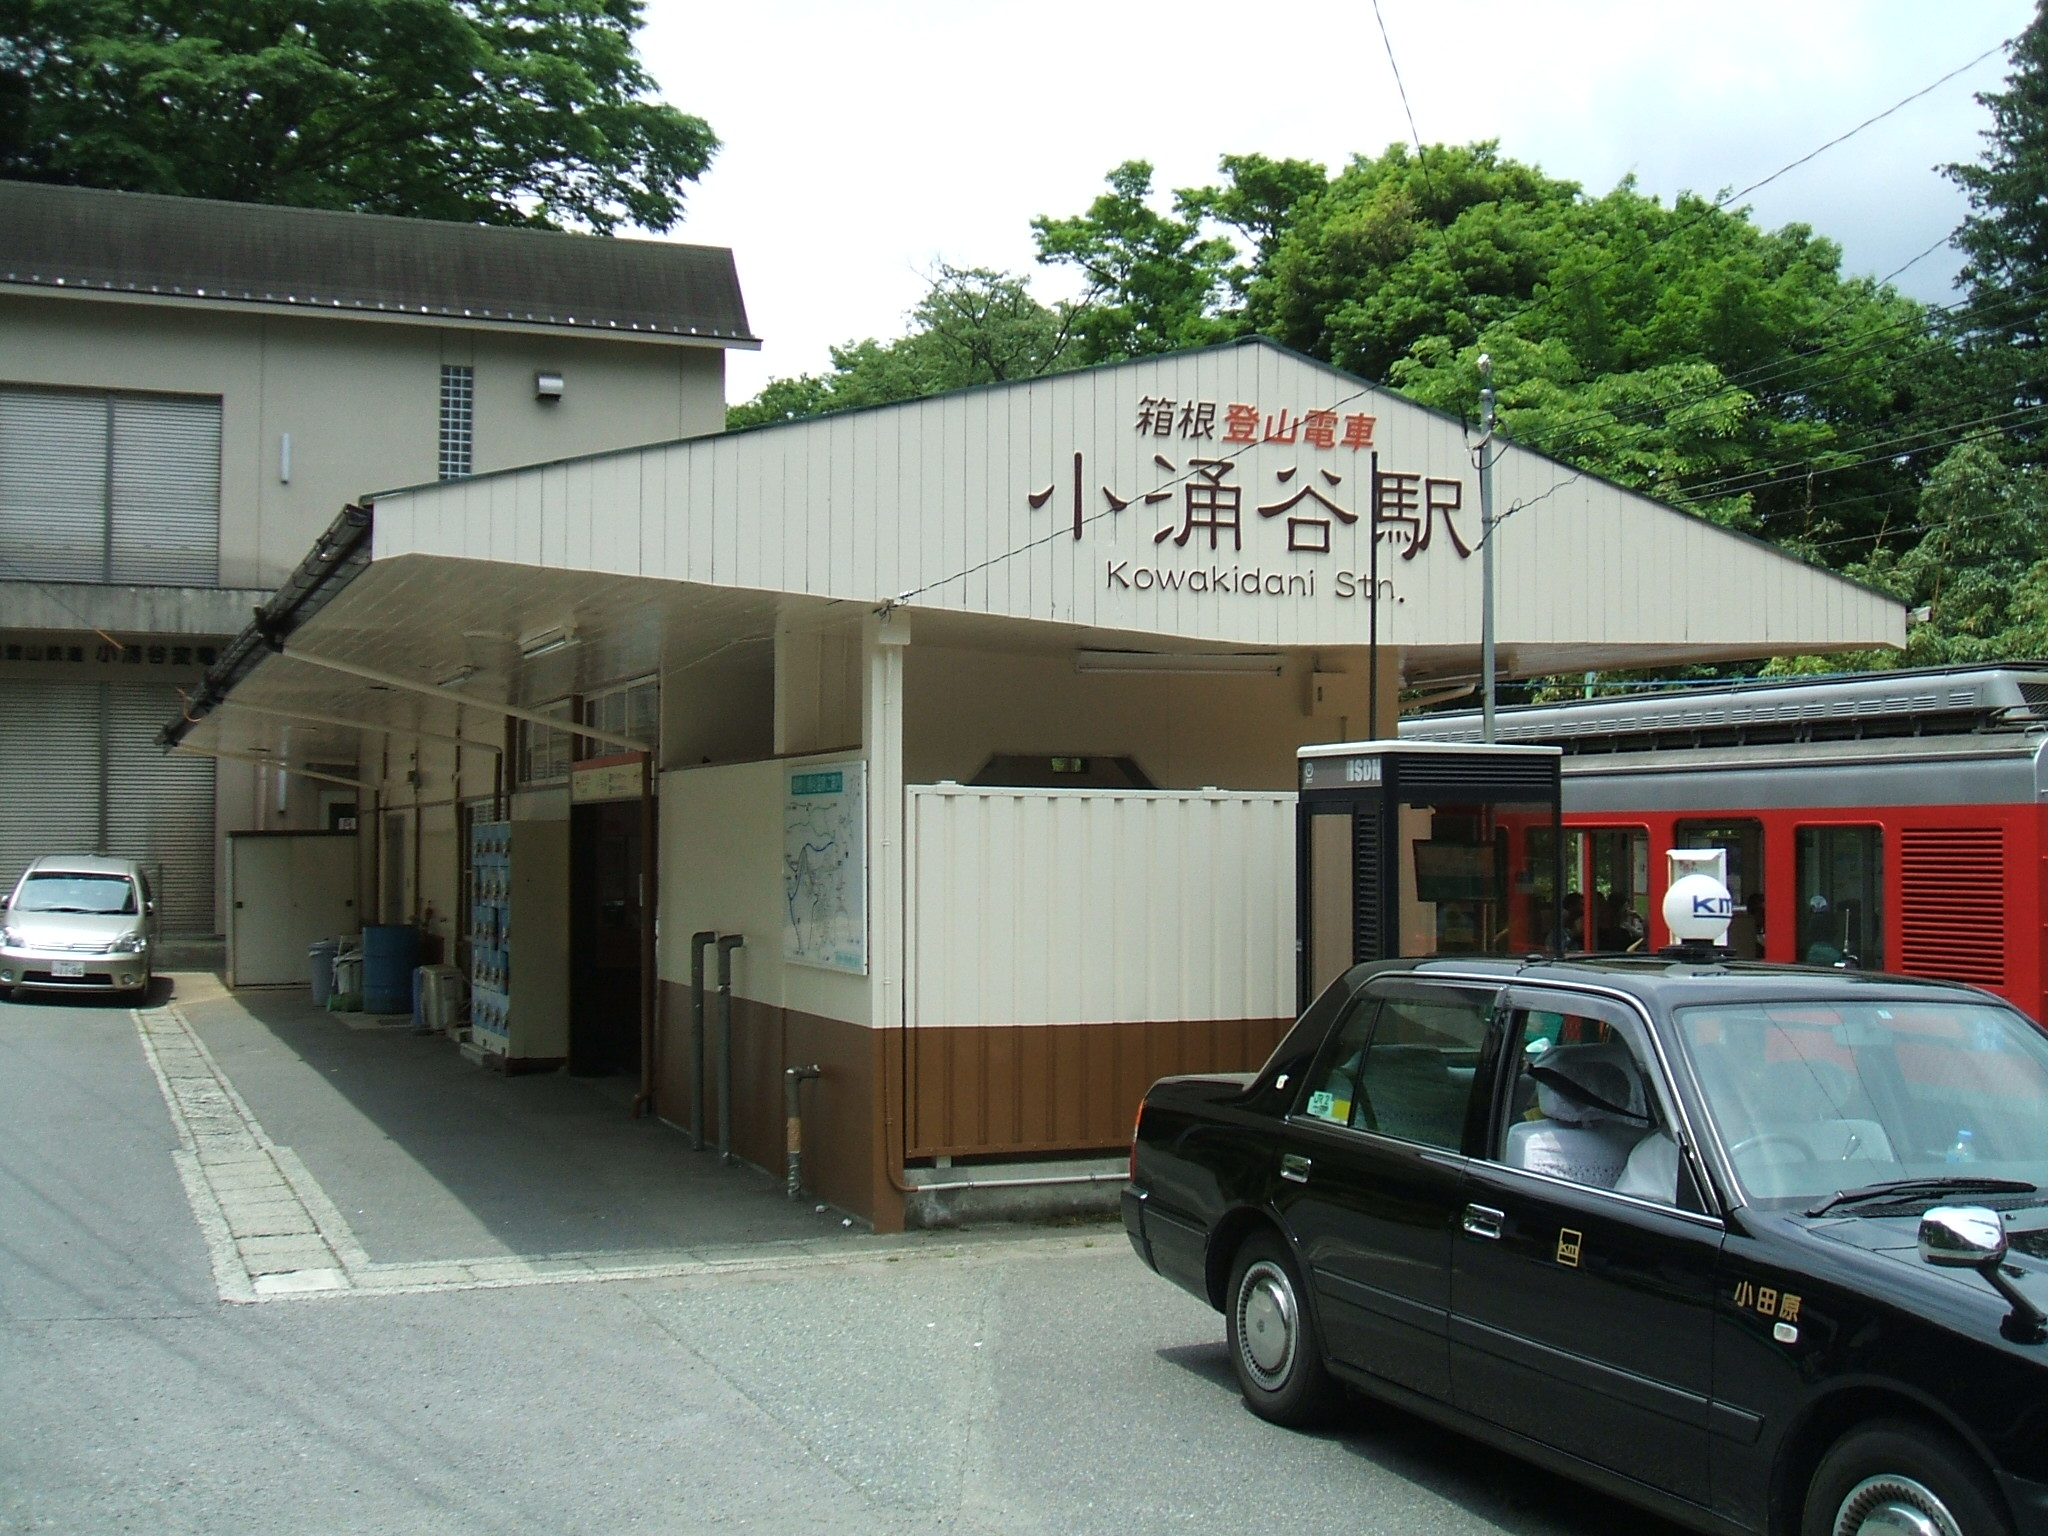 Gare de Kowakidani